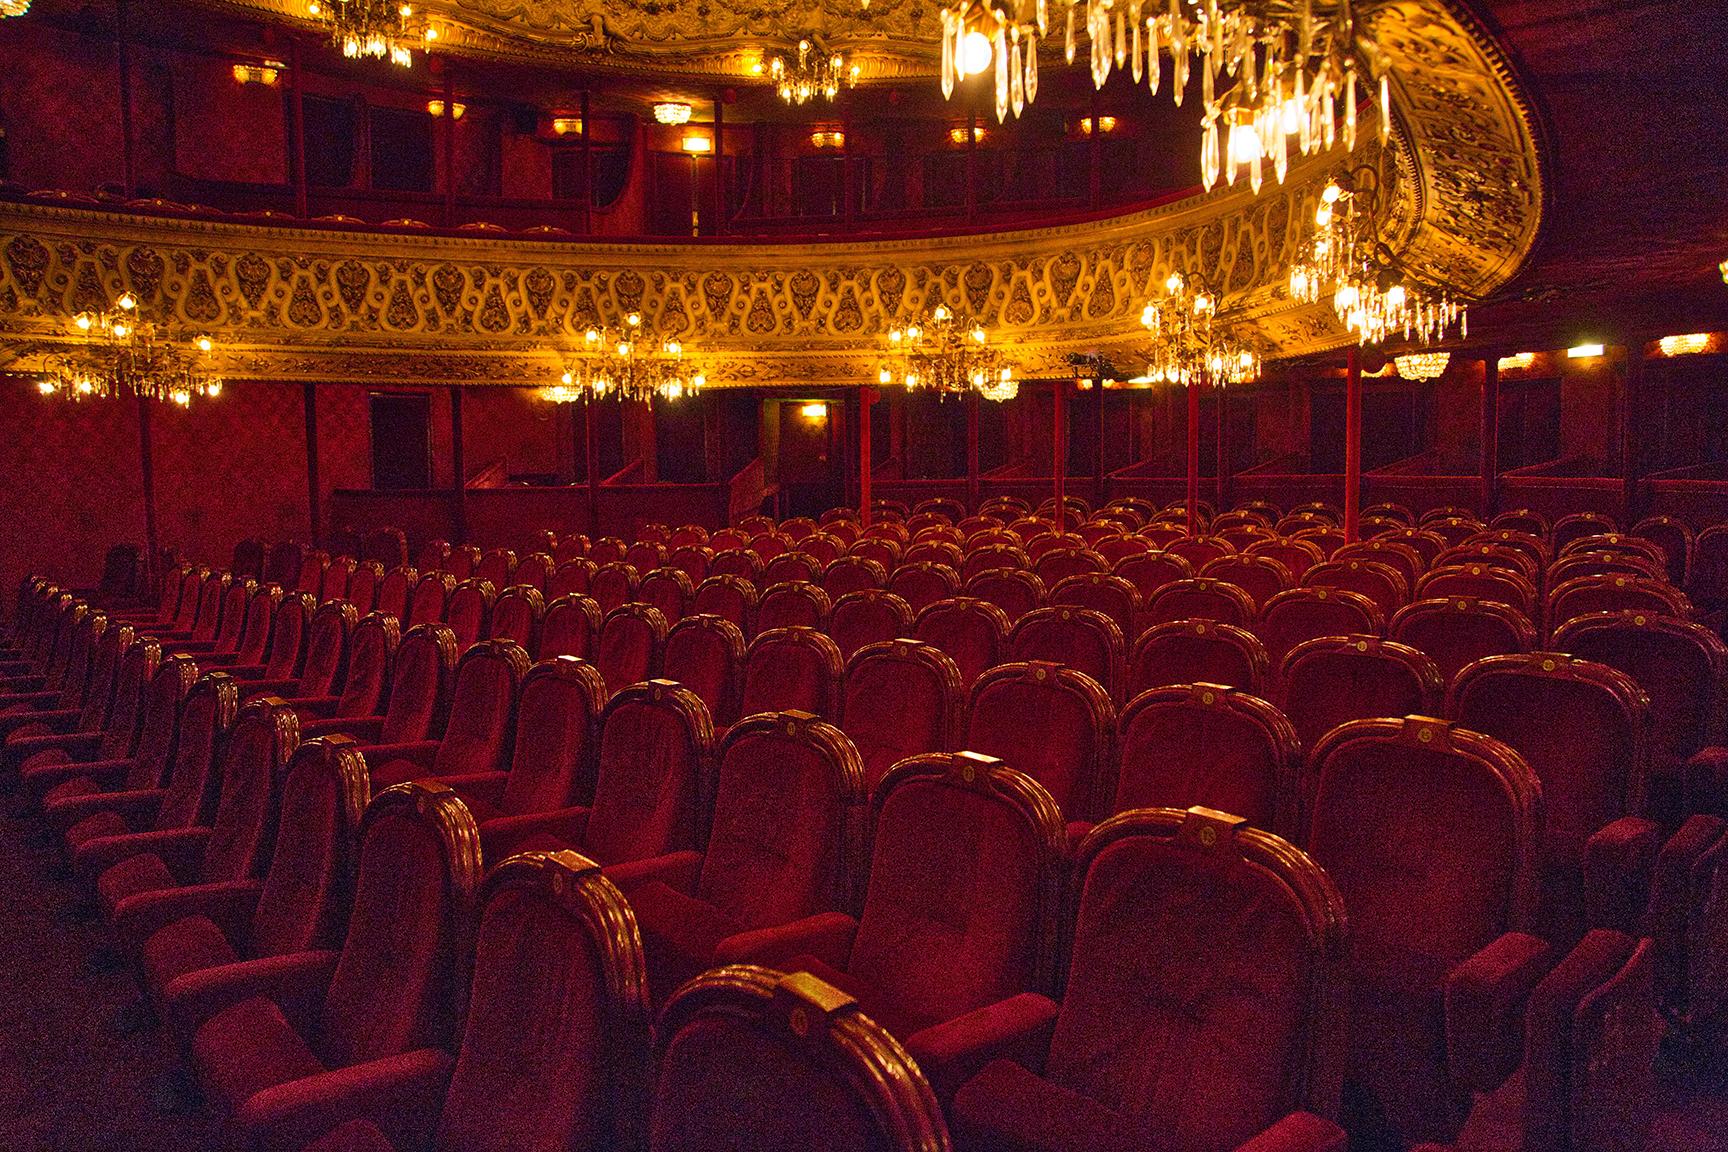 Overture, Curtains, Lights!